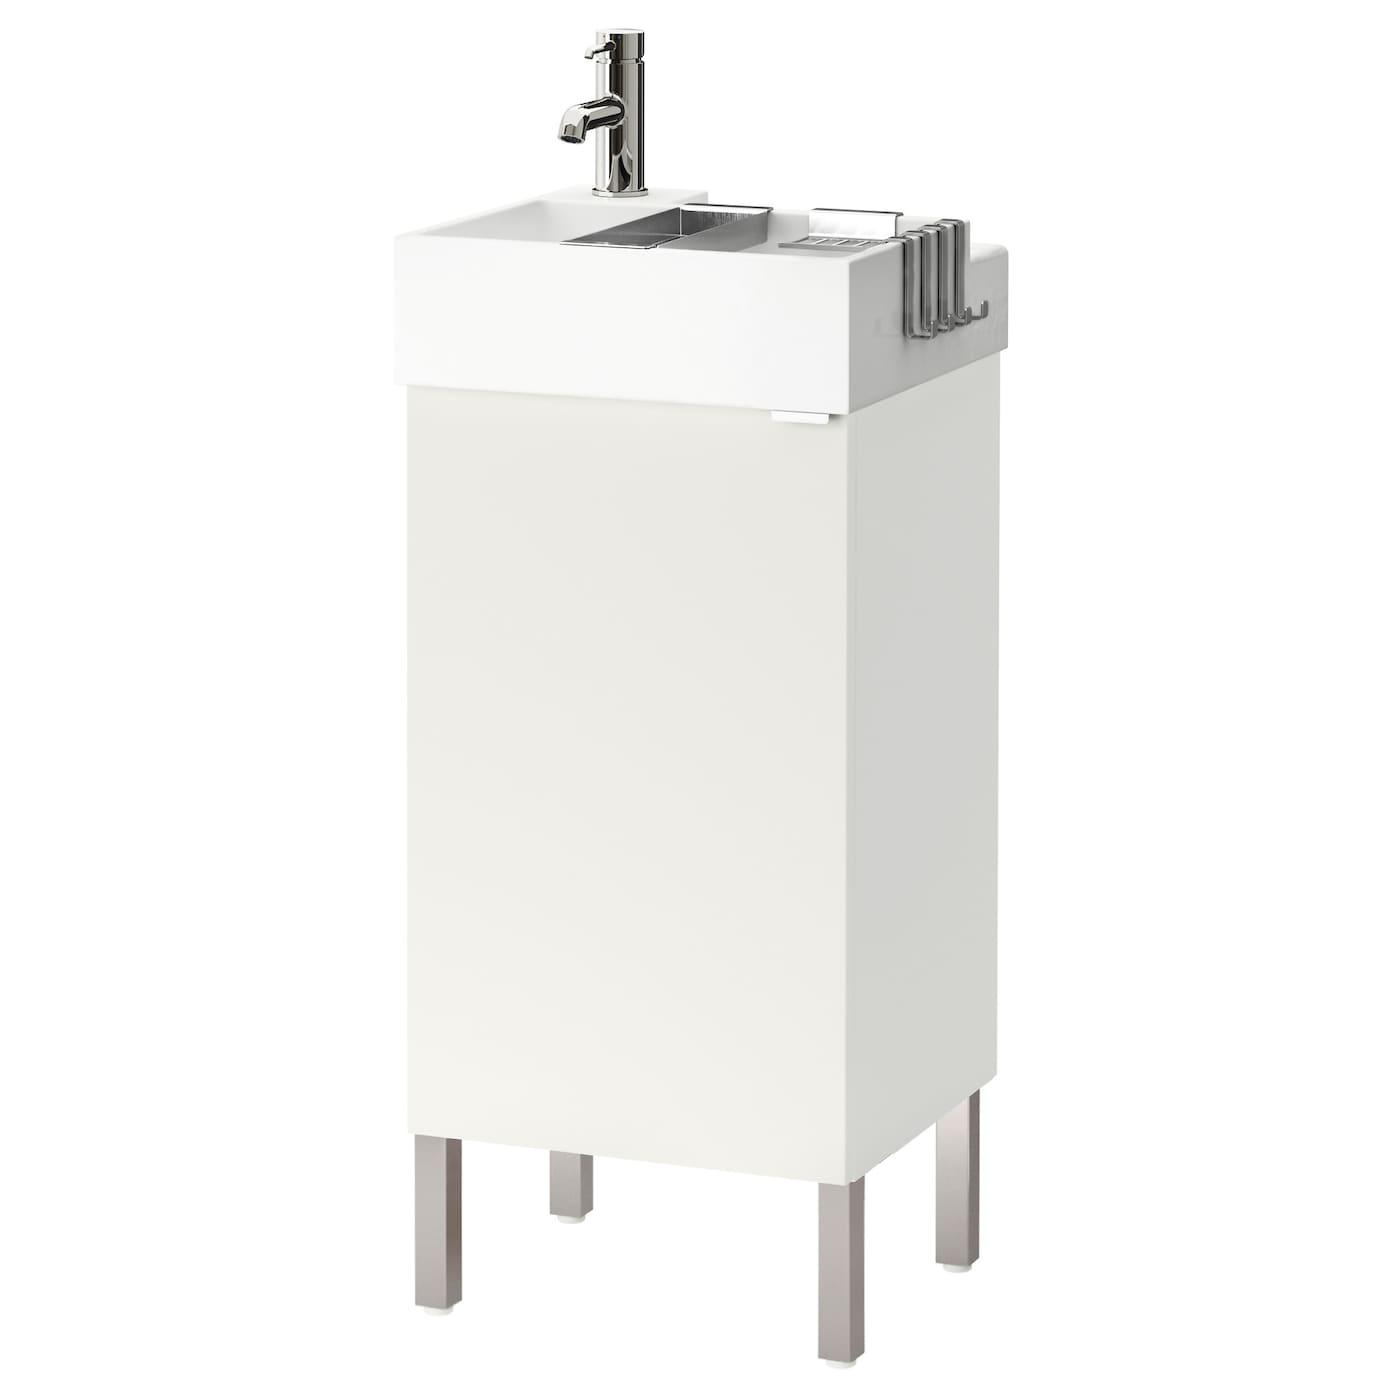 IKEA LILLNGEN Washbasin Cabinet With 1 Door